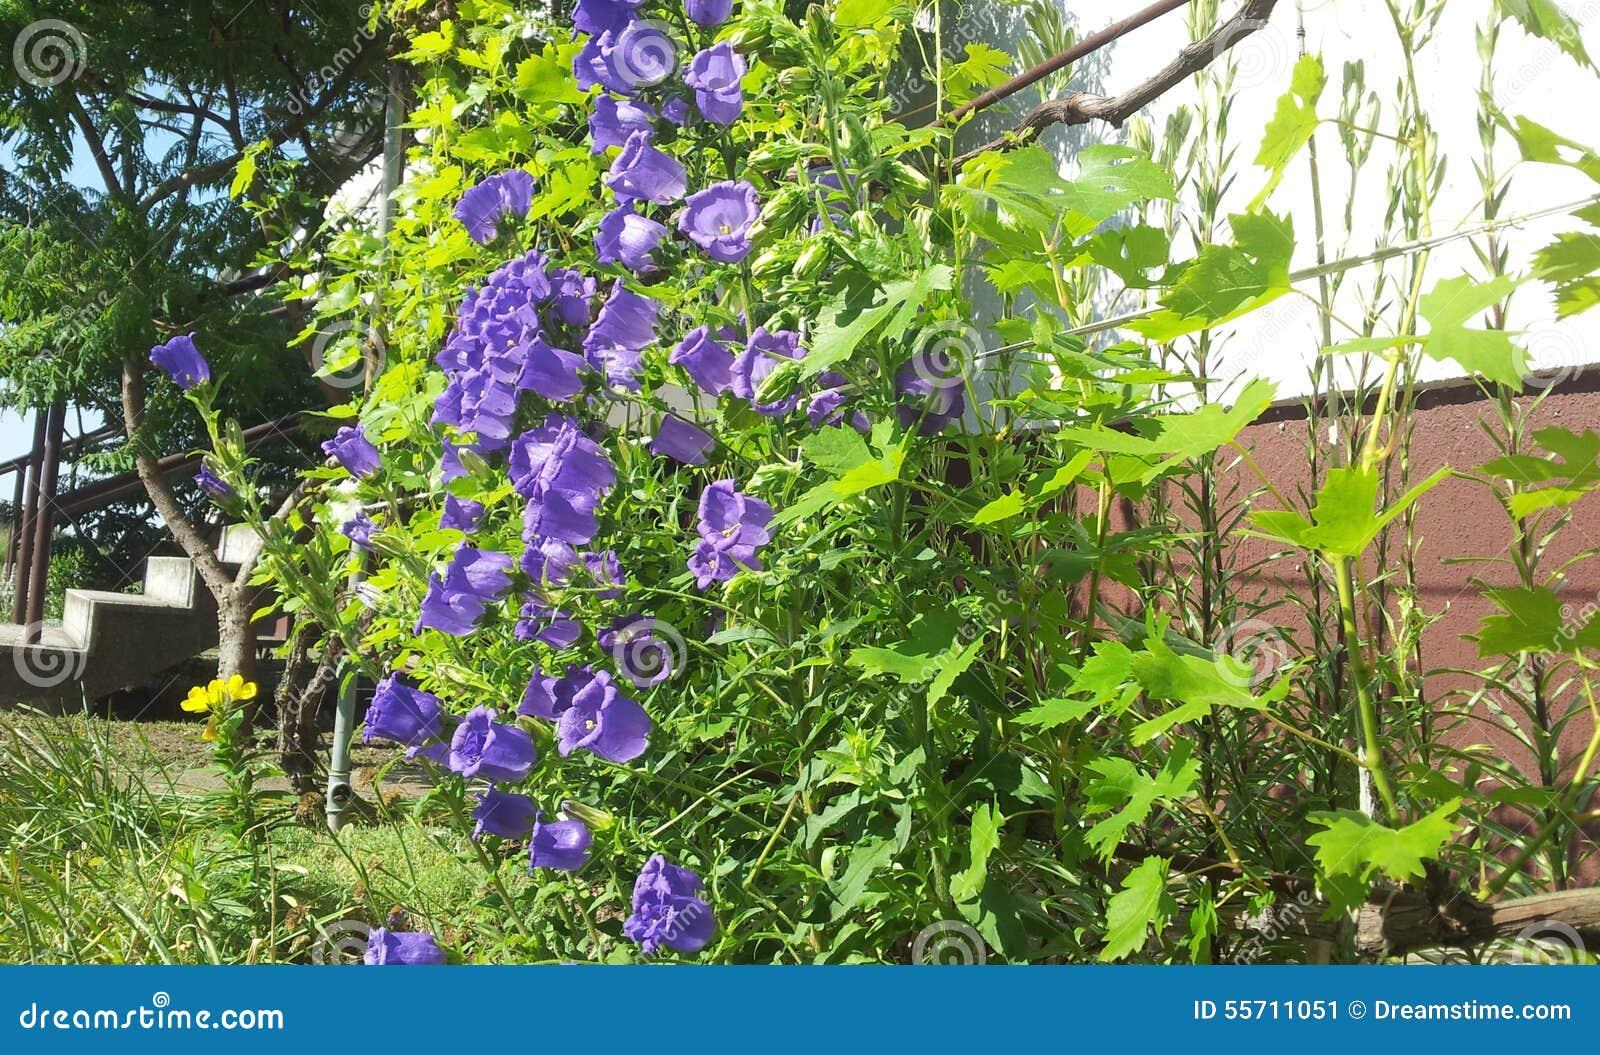 Purple bell flower stock photos royalty free pictures purple bell flower beautiful purple bell flower vine leaves company stock image mightylinksfo